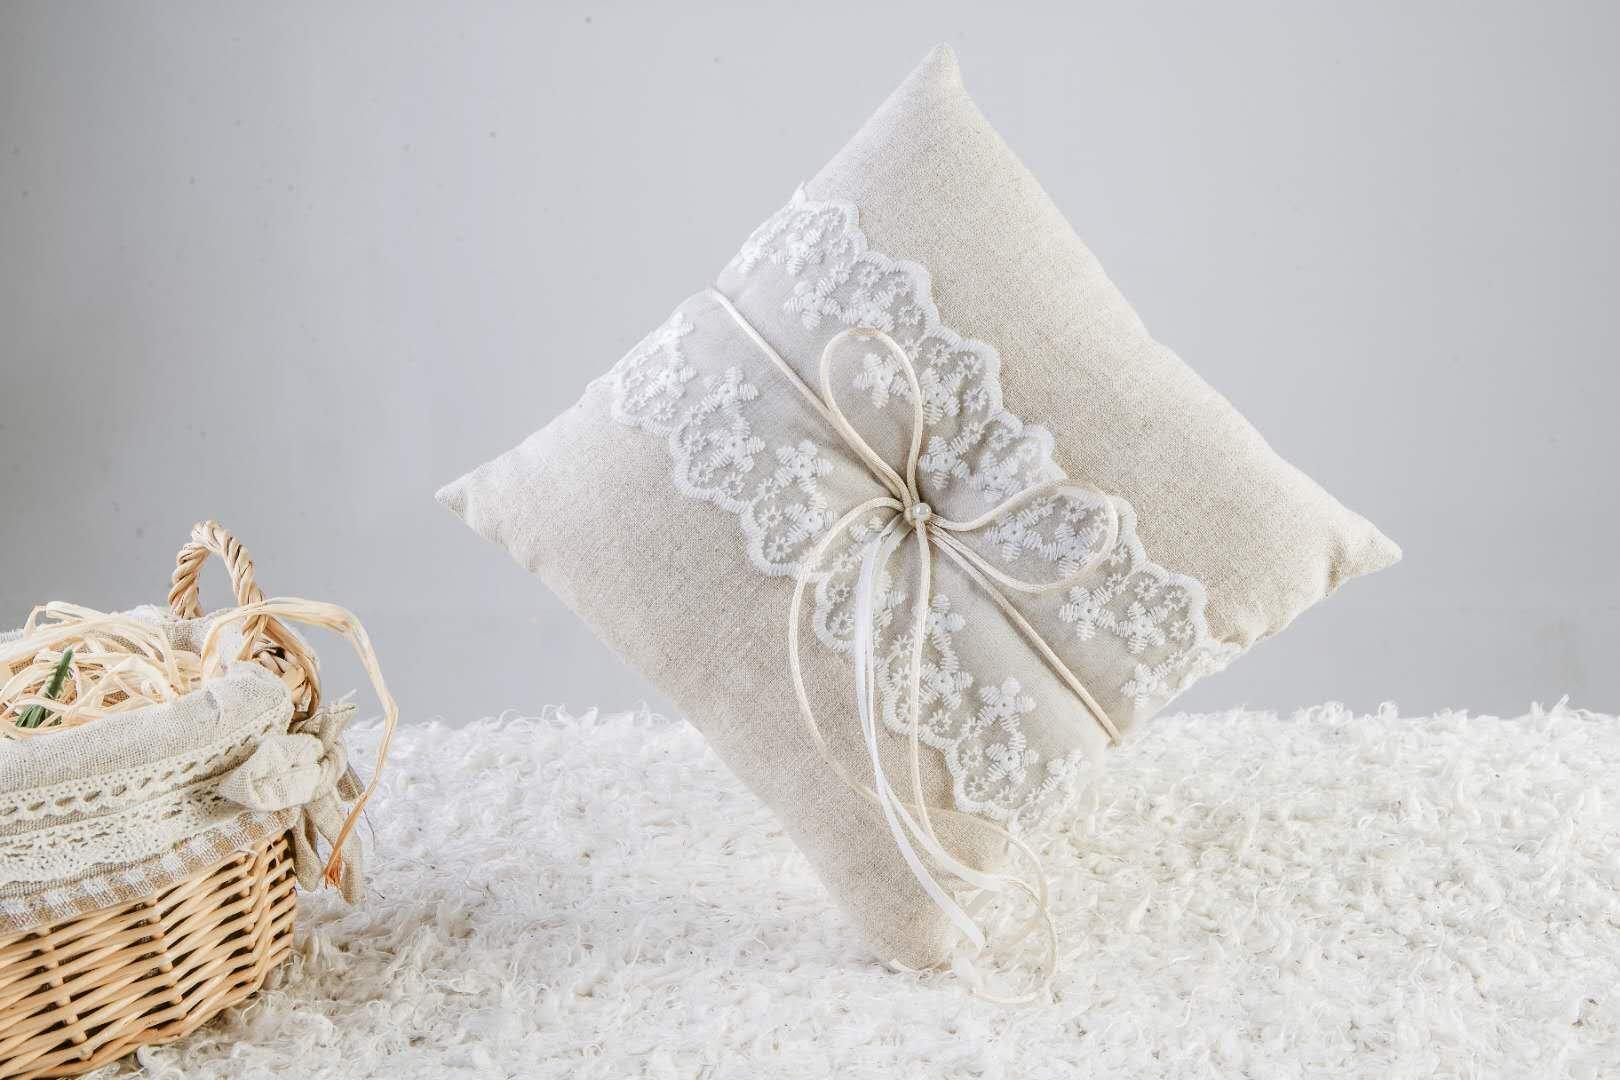 SCWEDDING Vintage Burlap Lace Bridal Wedding Ceremony Ring Bearer Pillow Cushion 21x21cm